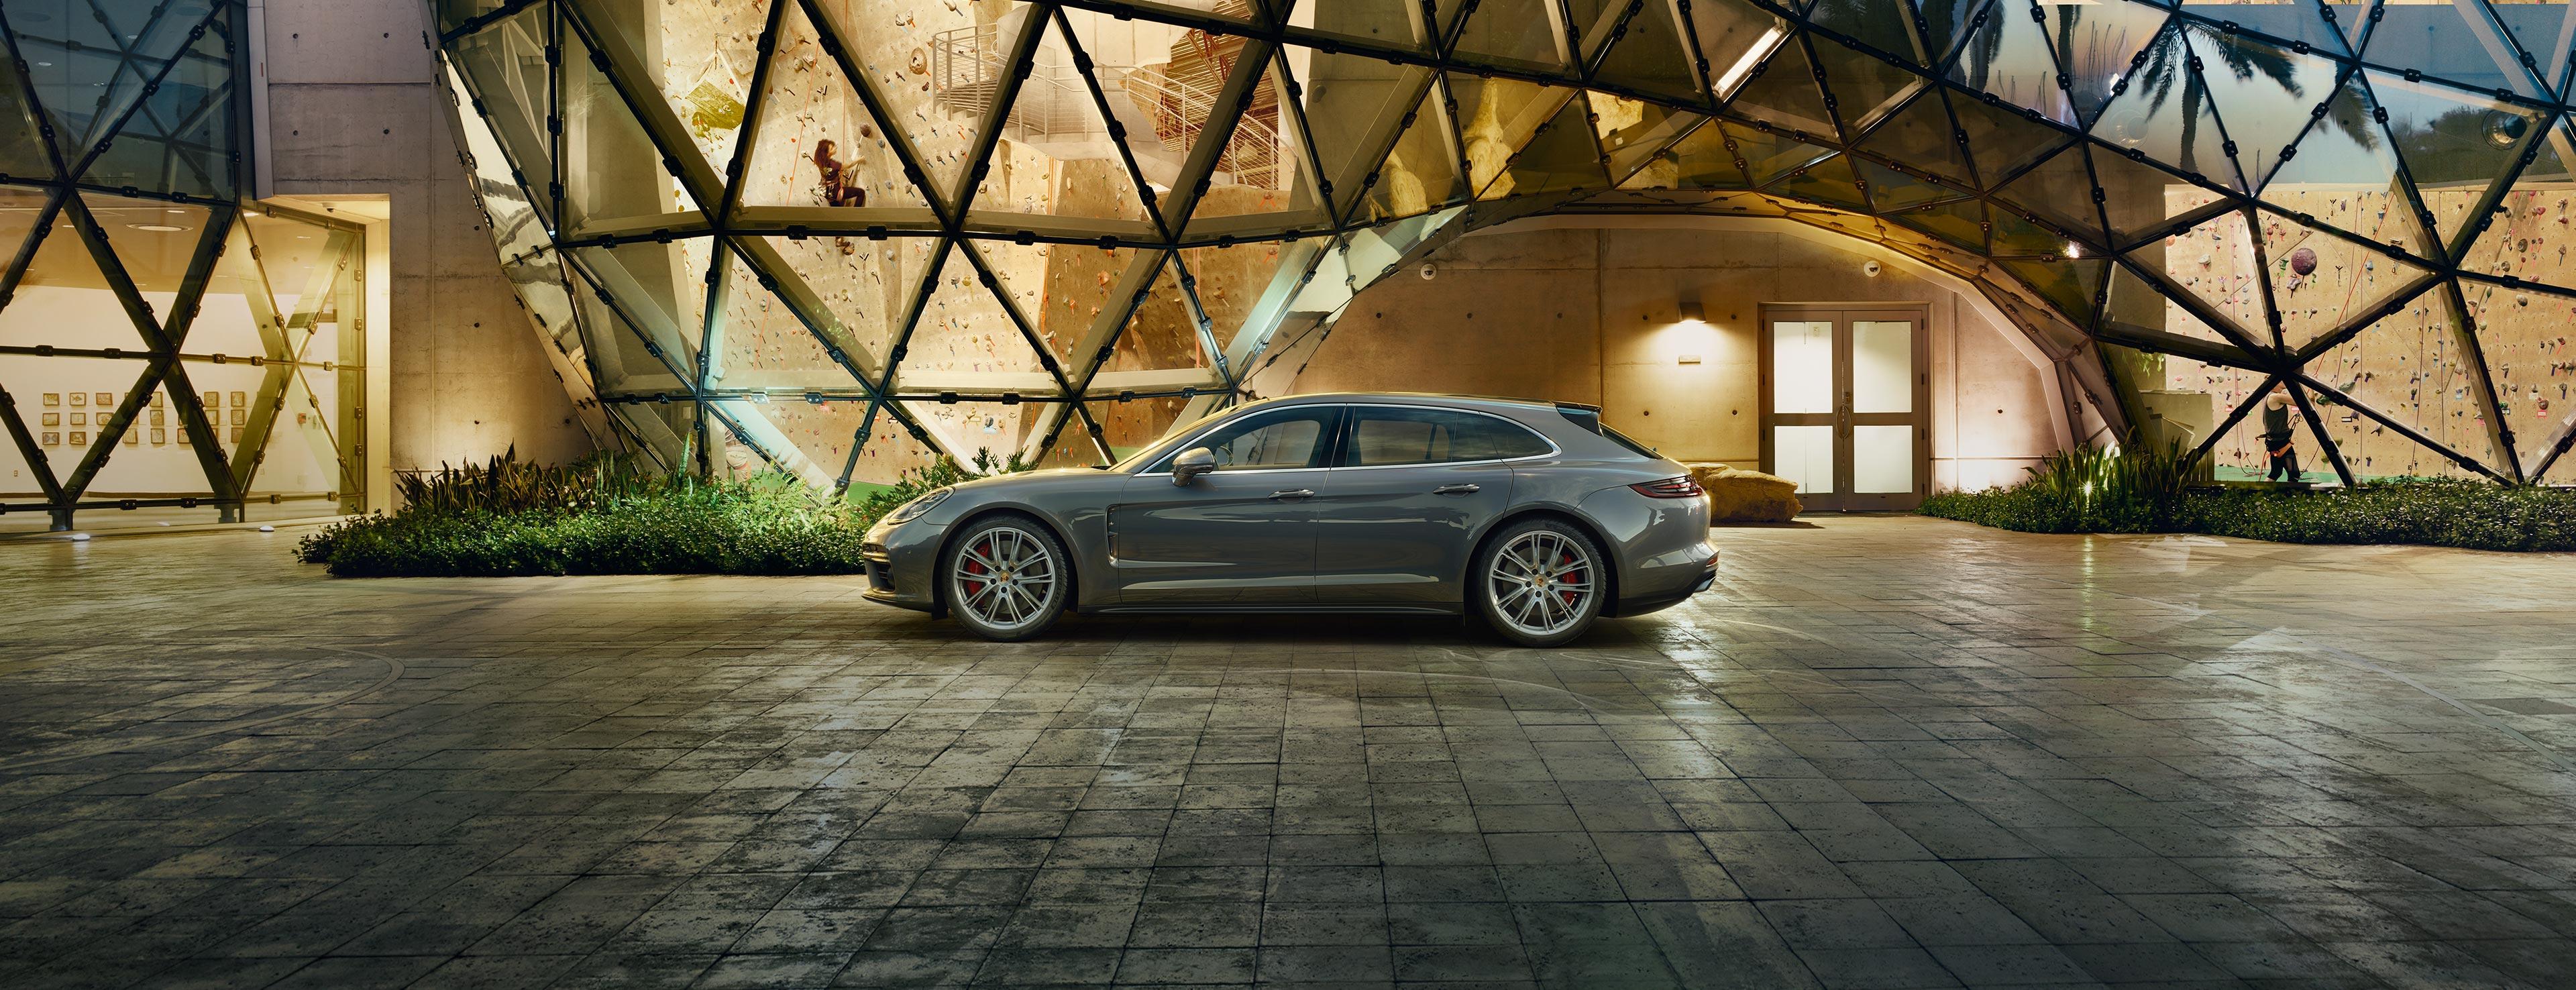 porsche-normal Extraordinary Porsche 918 Spyder Weissach Package Precio Cars Trend